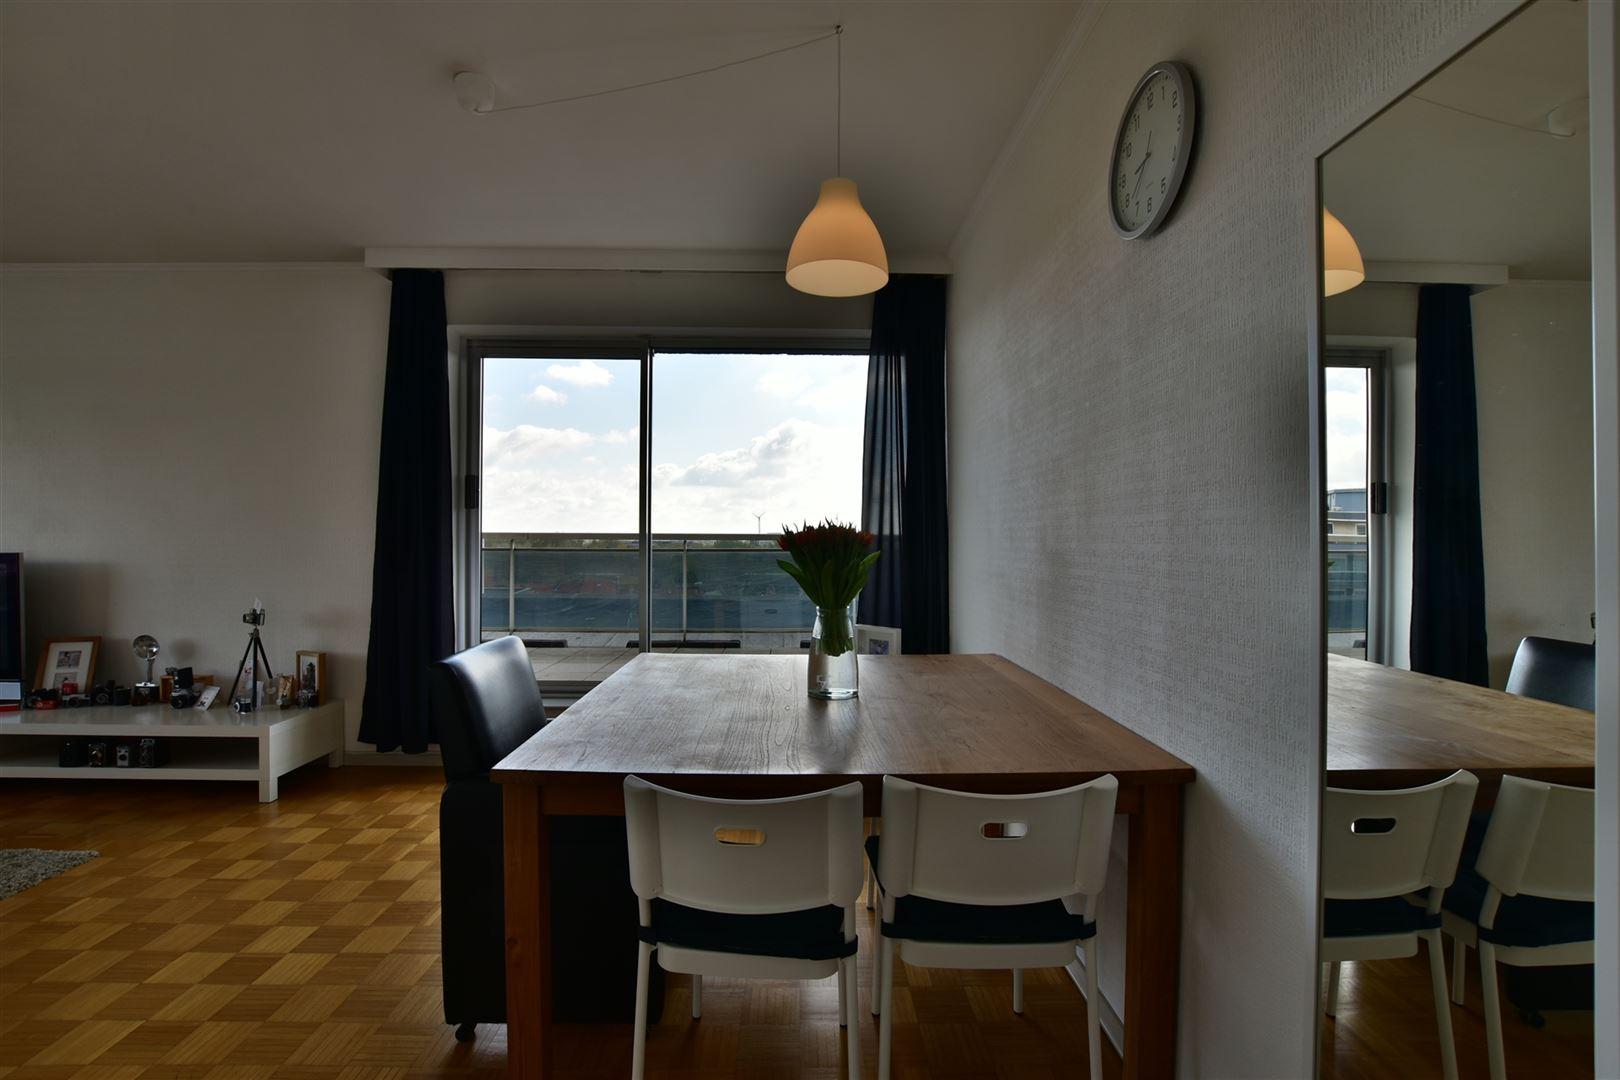 Foto 3 : Appartement te 9200 DENDERMONDE (België) - Prijs € 169.000